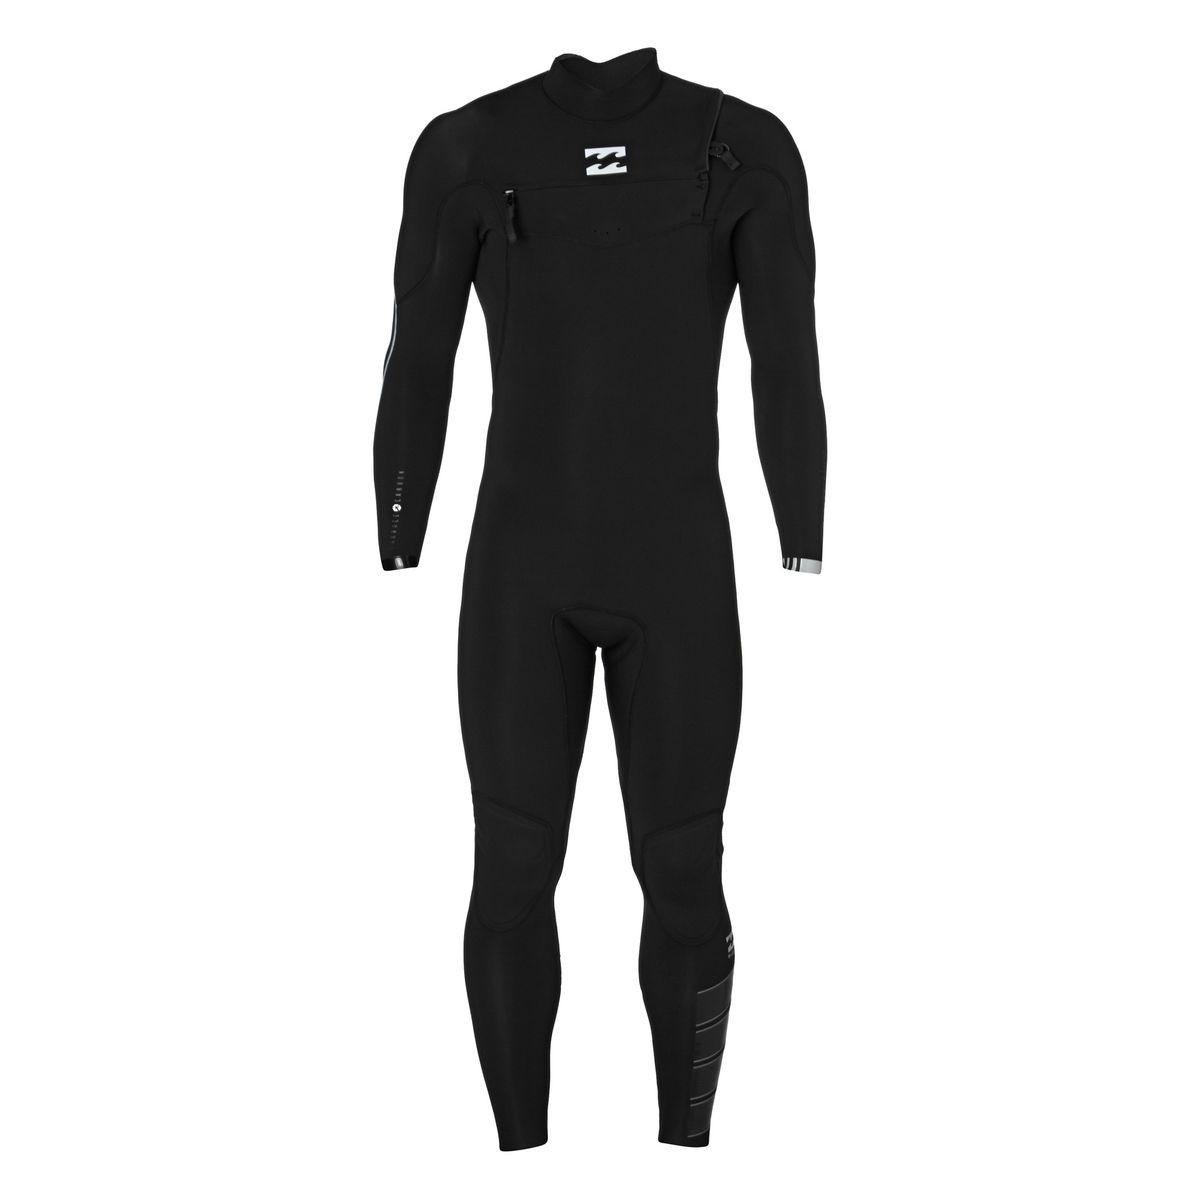 Billabong Furnace Comp 4/3mm 2017 Chest Zip Wetsuit - Black